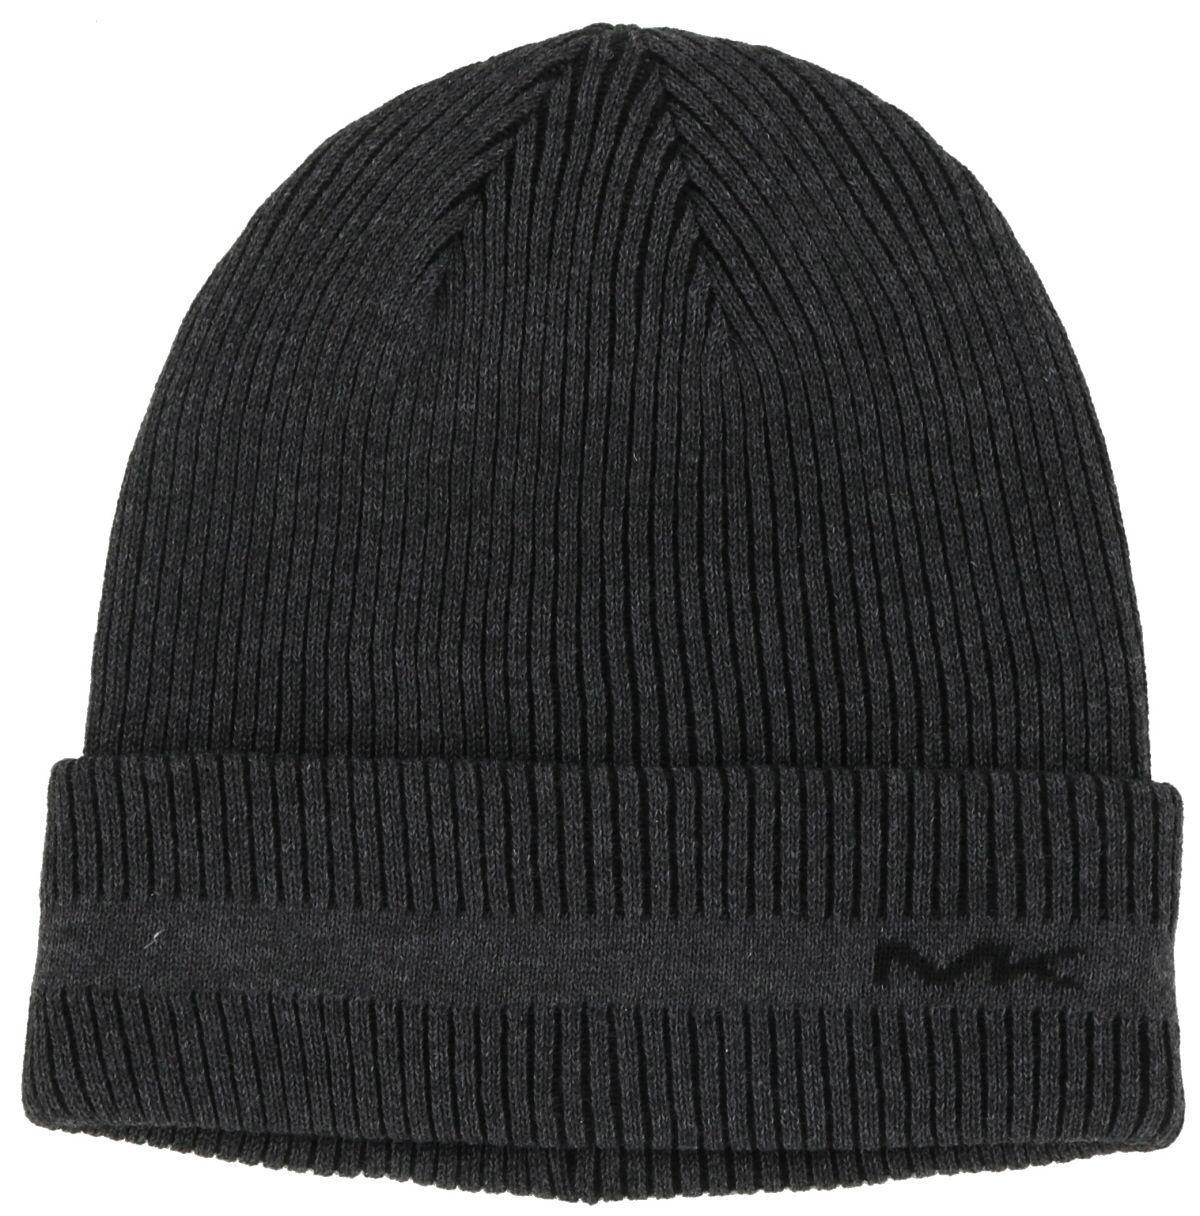 Michael Kors Hat In Charcoal